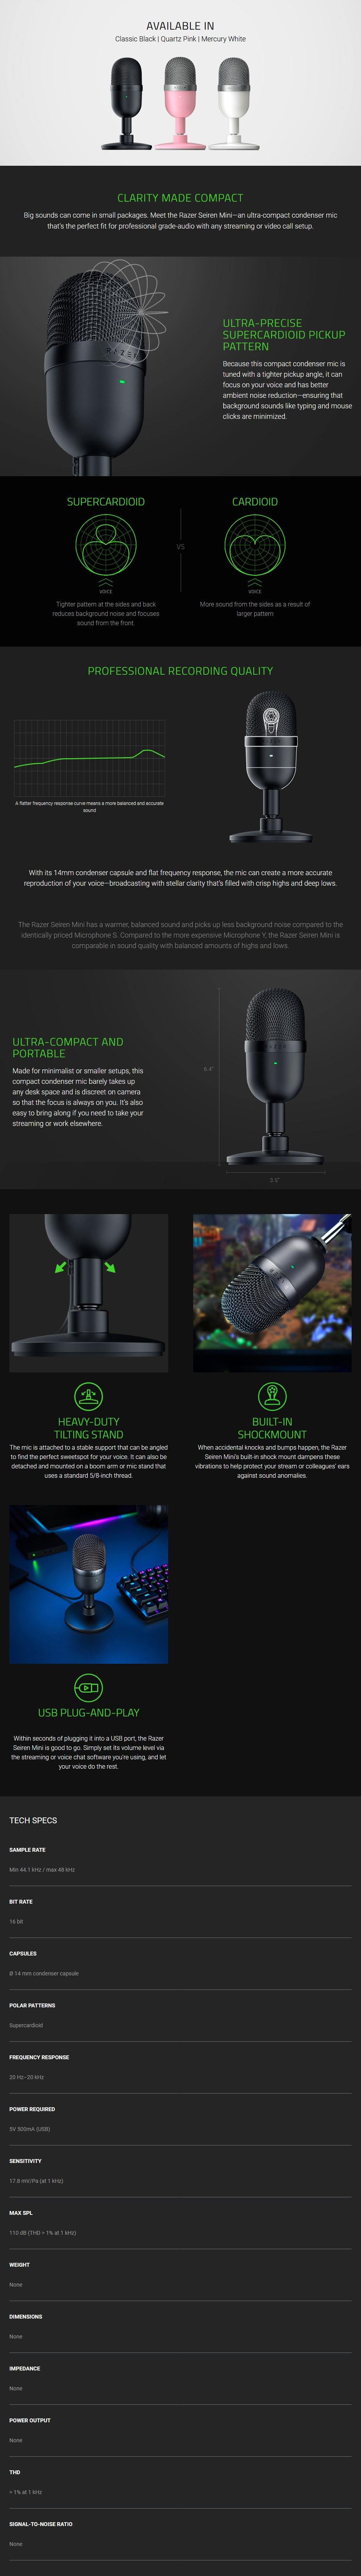 razer-seiren-mini-ultracompact-condenser-microphone-ac39608-1.jpg